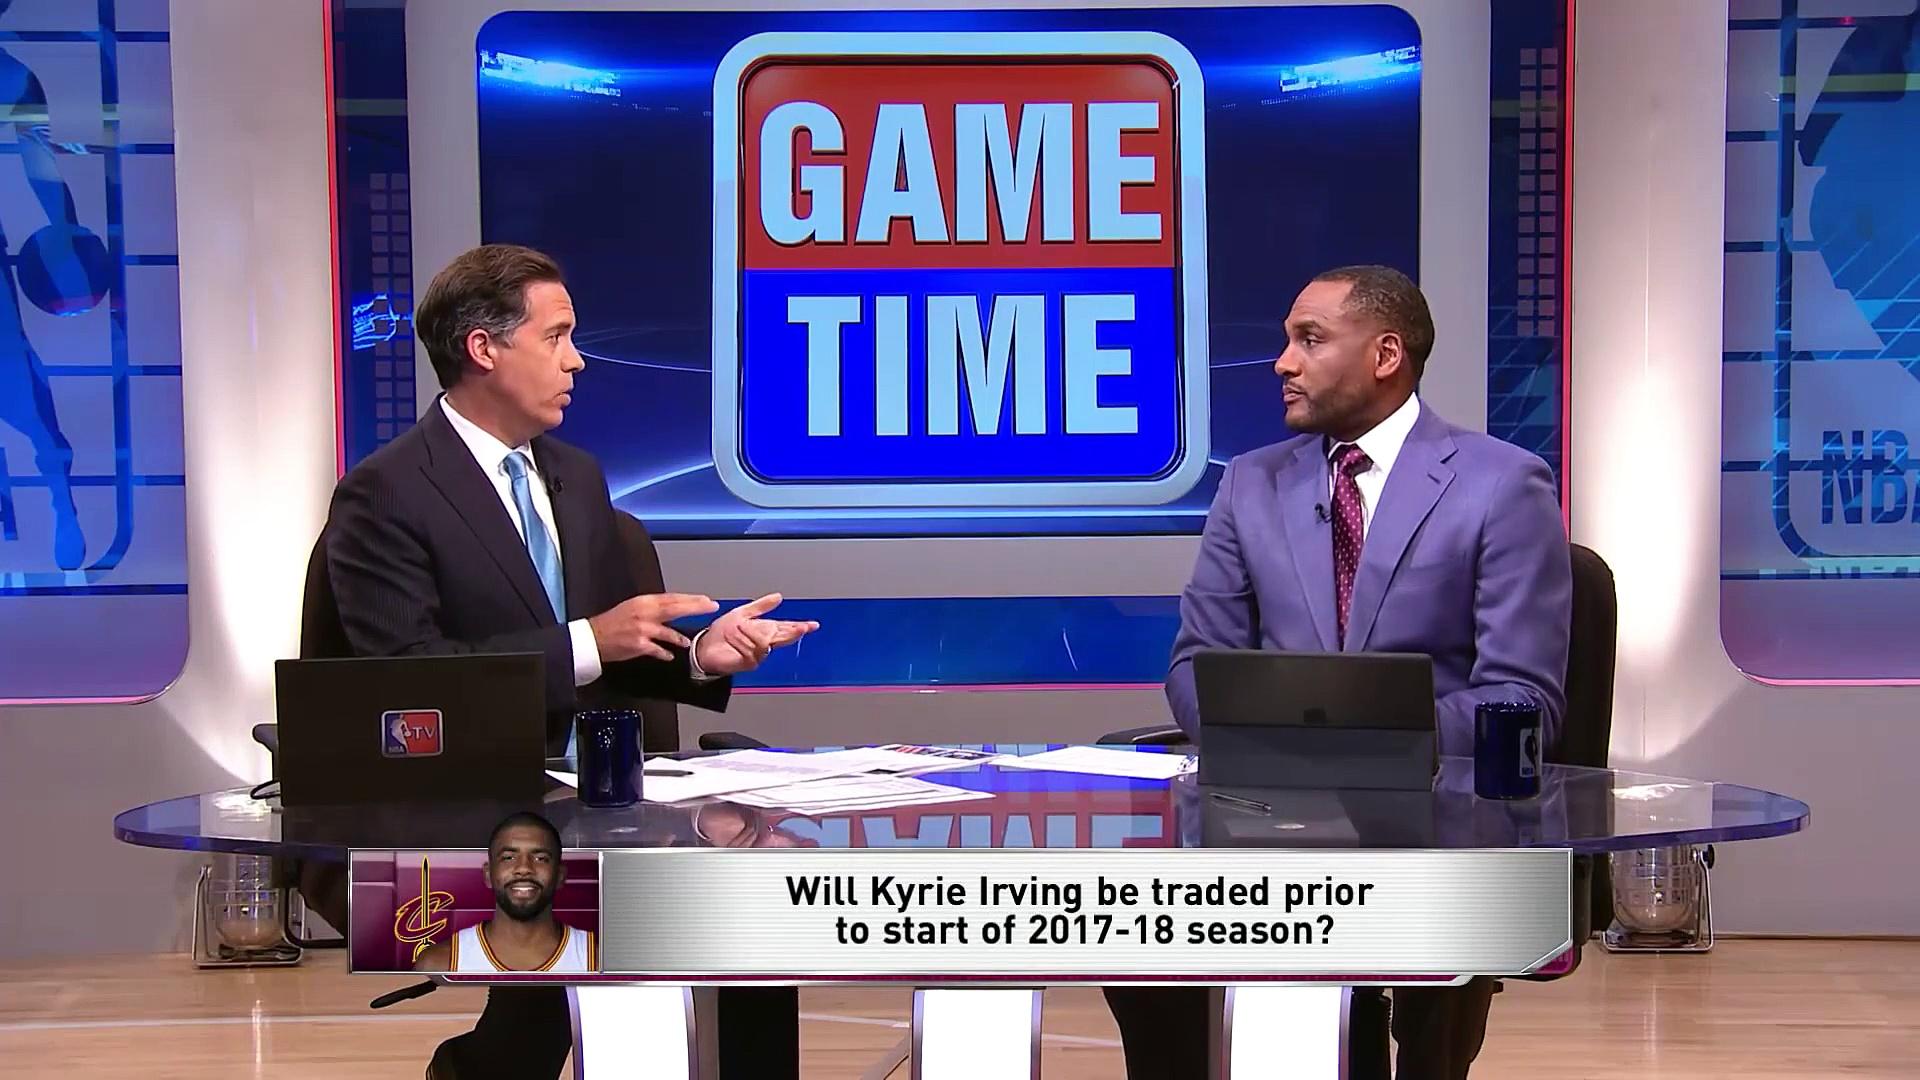 【NBA】Kyrie Irving Trade Update – Phoenix Suns – GameTime  2017 NBA Free Agency